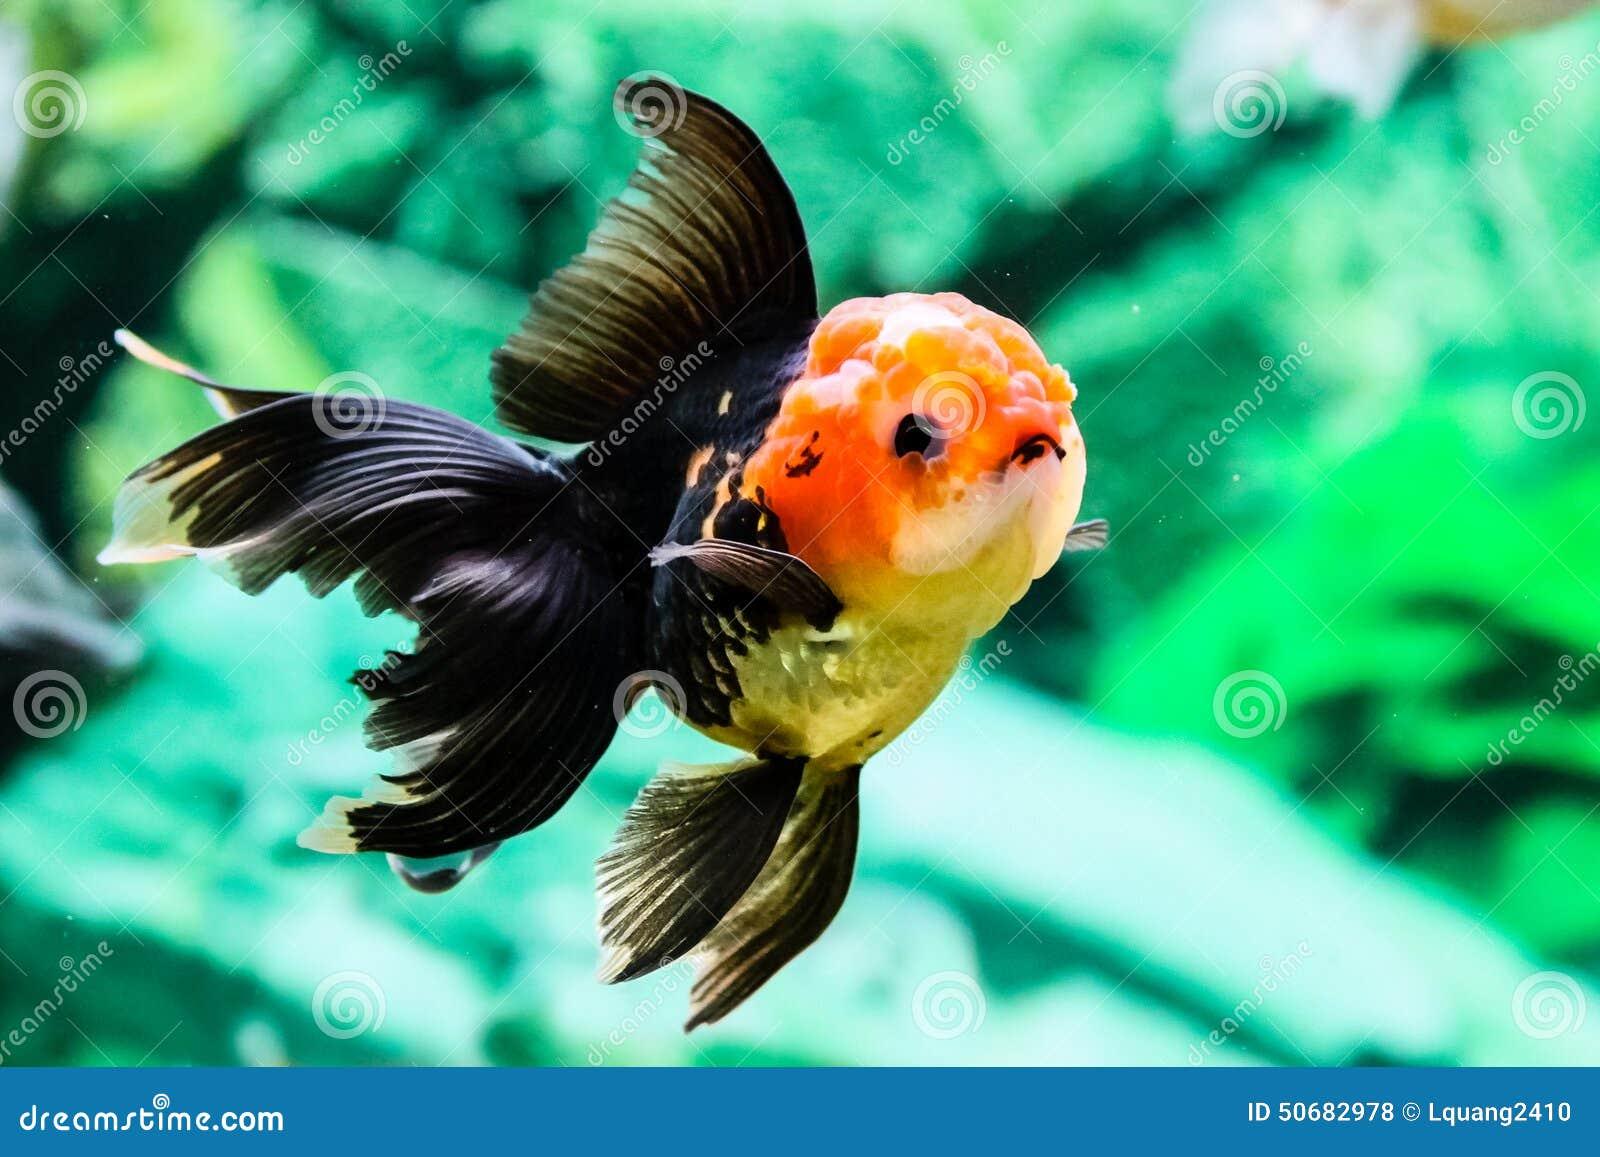 Download 关闭在水族馆的金鱼 库存照片. 图片 包括有 飞翅, 敌意, 移动, 橙色, beauvoir, 结算, 概念性 - 50682978